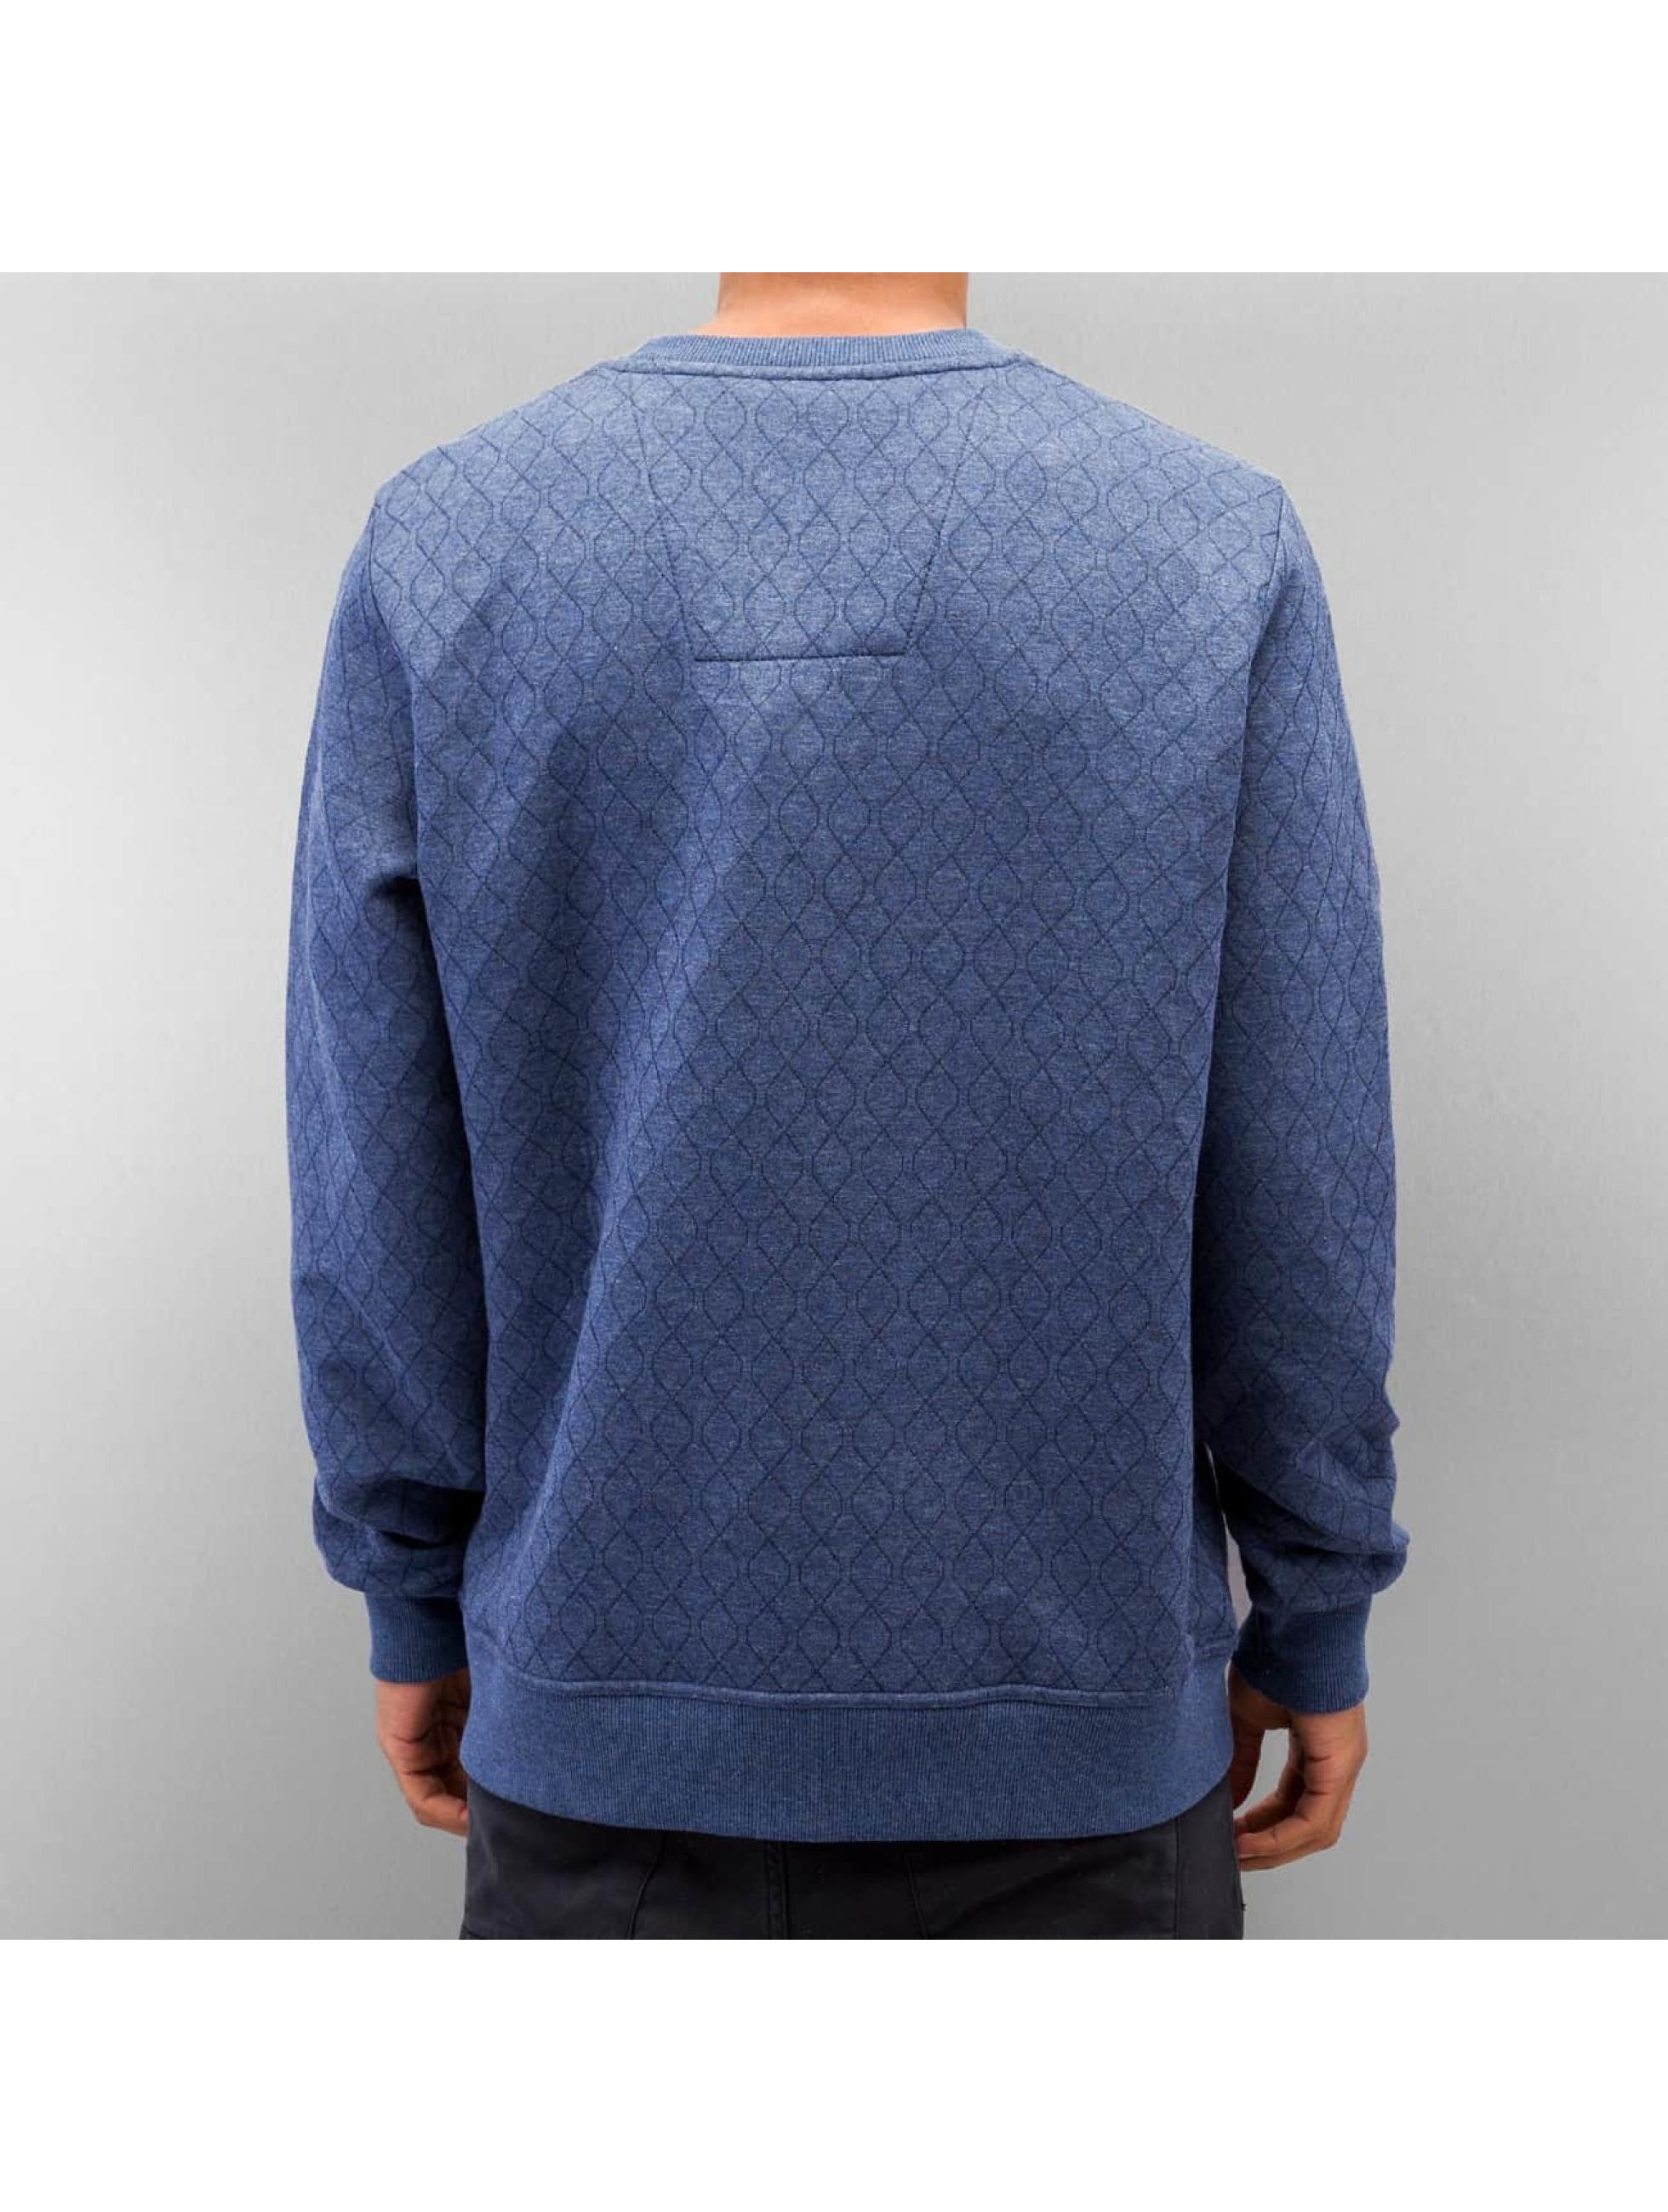 G-Star Sweat & Pull Heldrex Utah Jacquard bleu